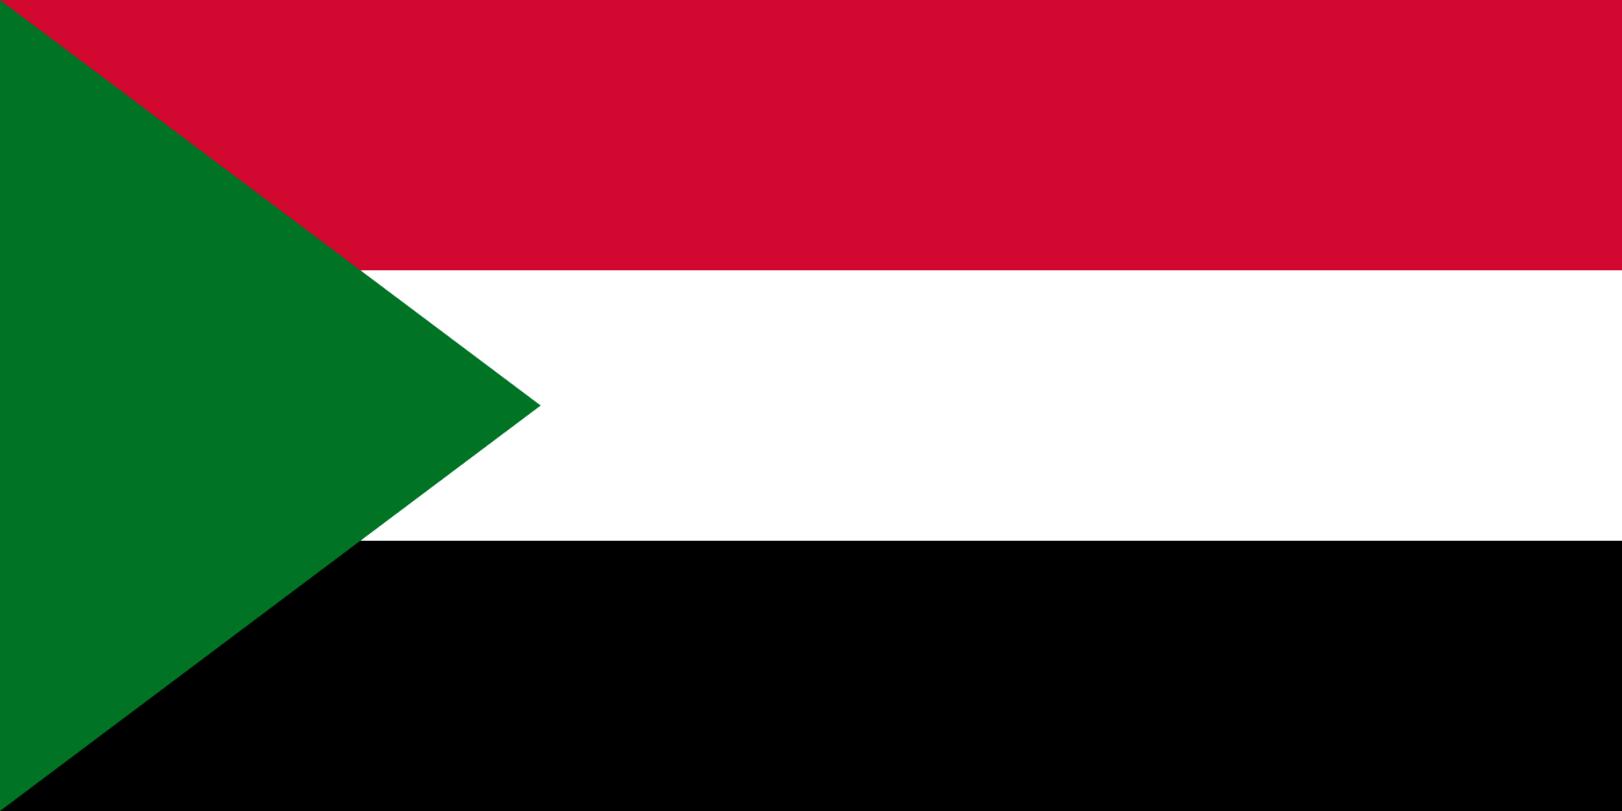 Flagge im Querformat Land Sudan 150x100 cm